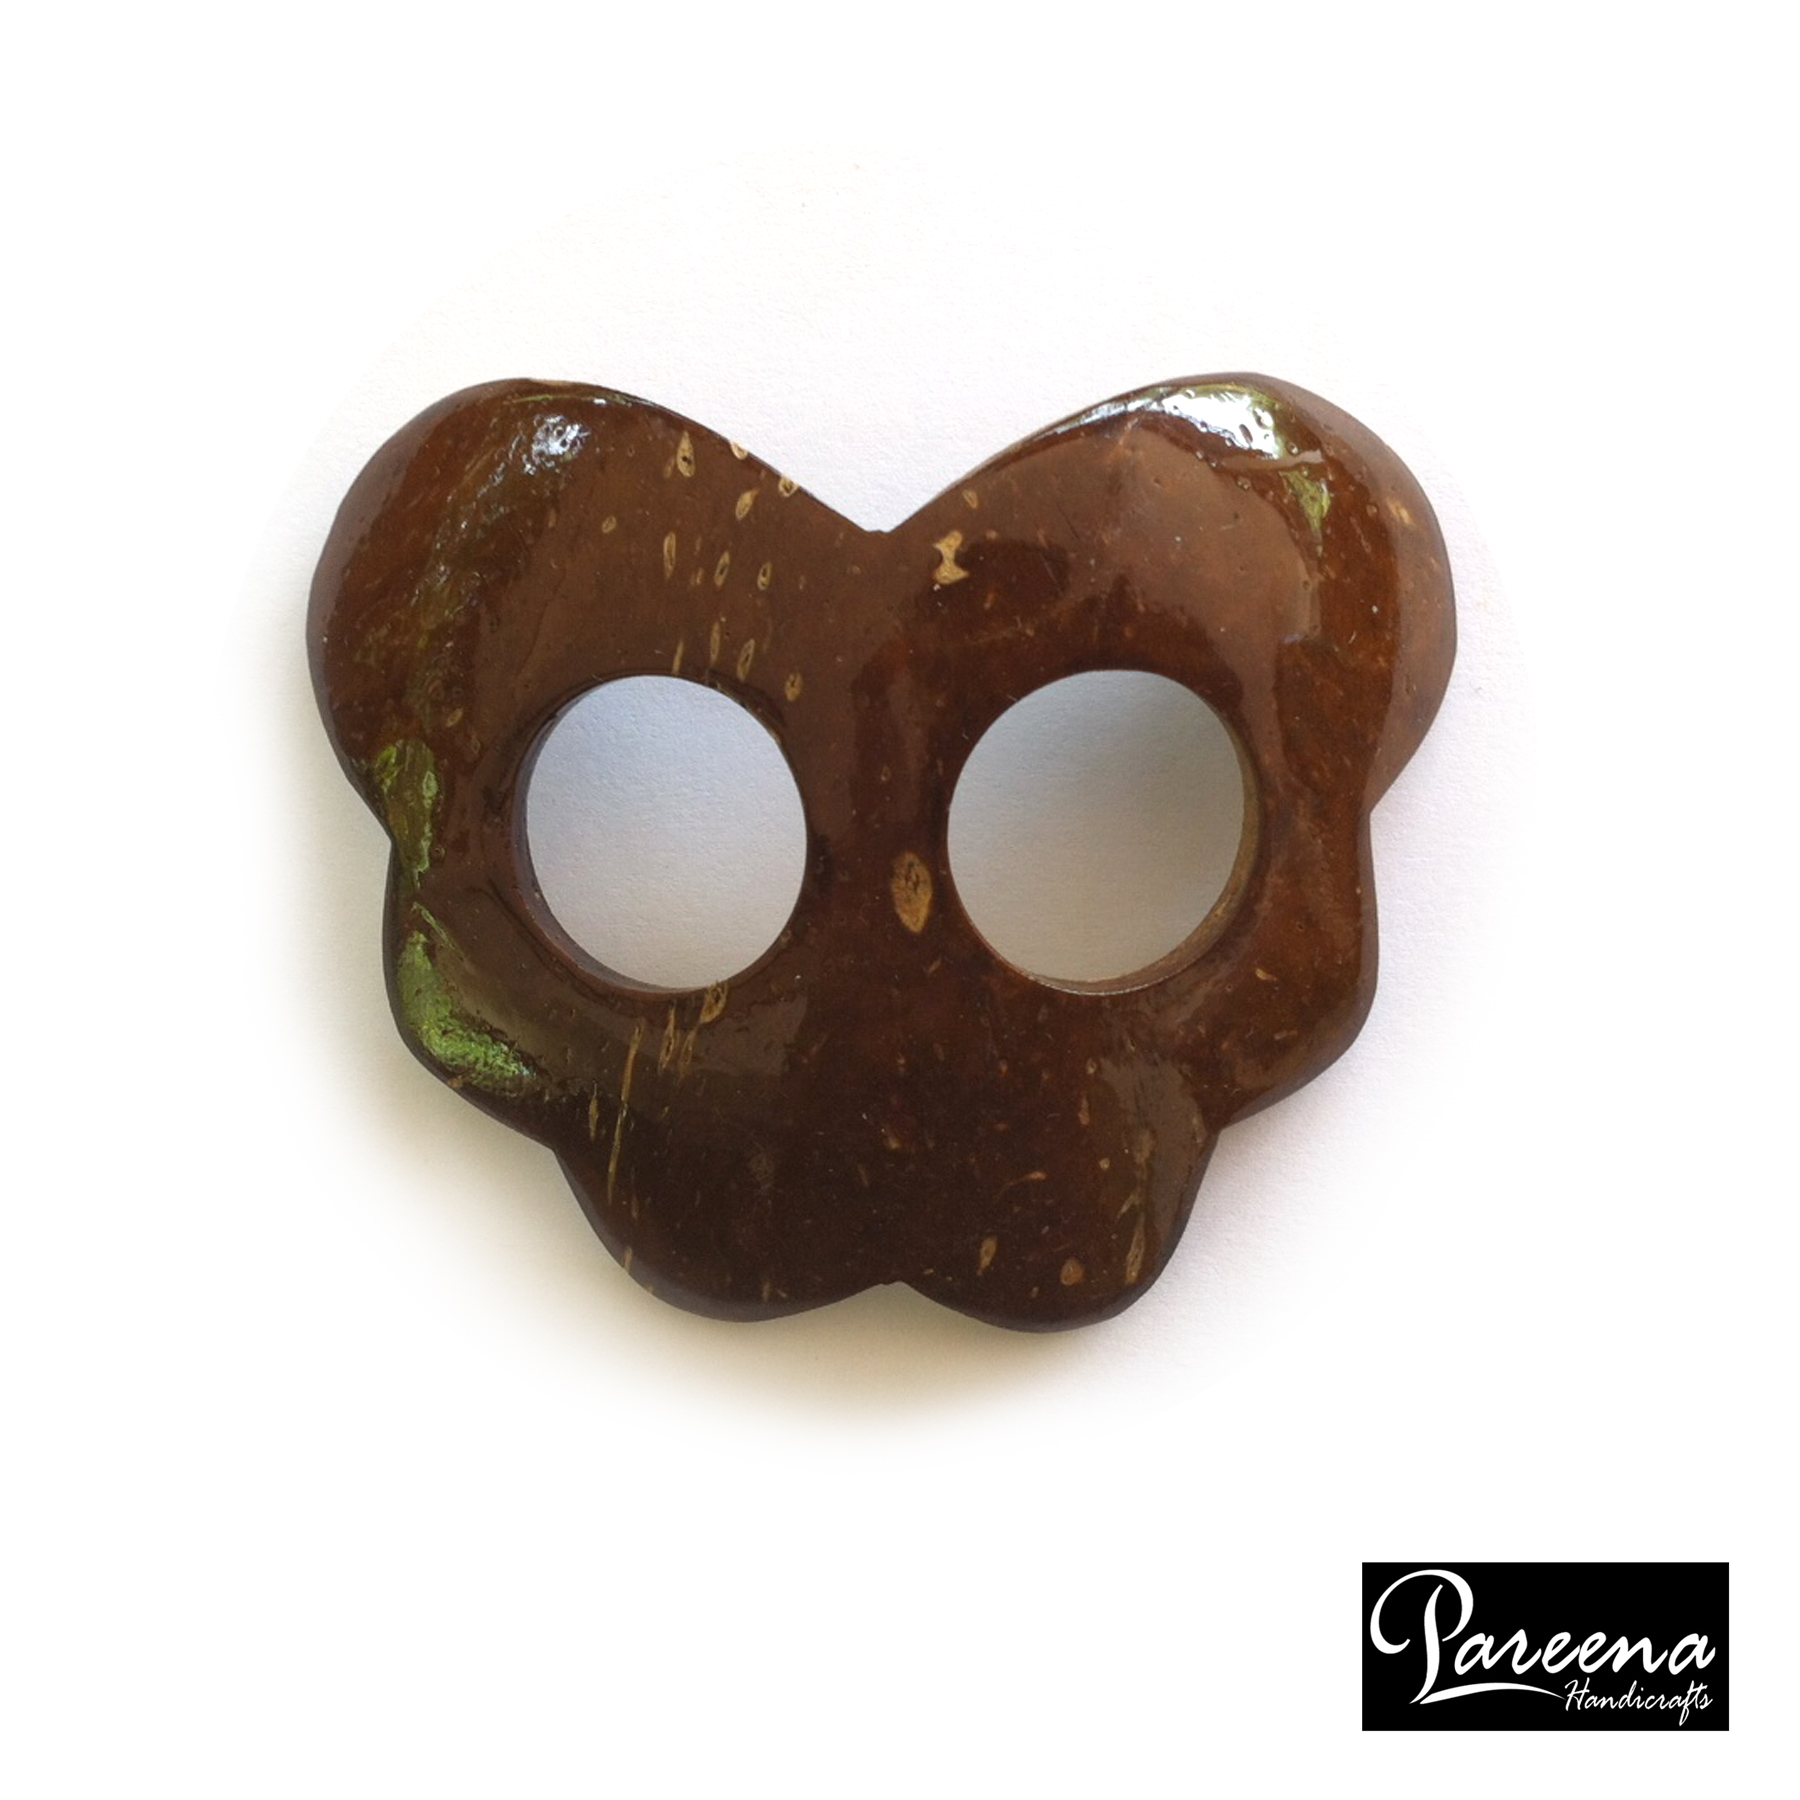 Coconut Buckle , Butterfly Picture (หัวเข็มขัดกะลามะพร้าวรูปผีเสื้อ)